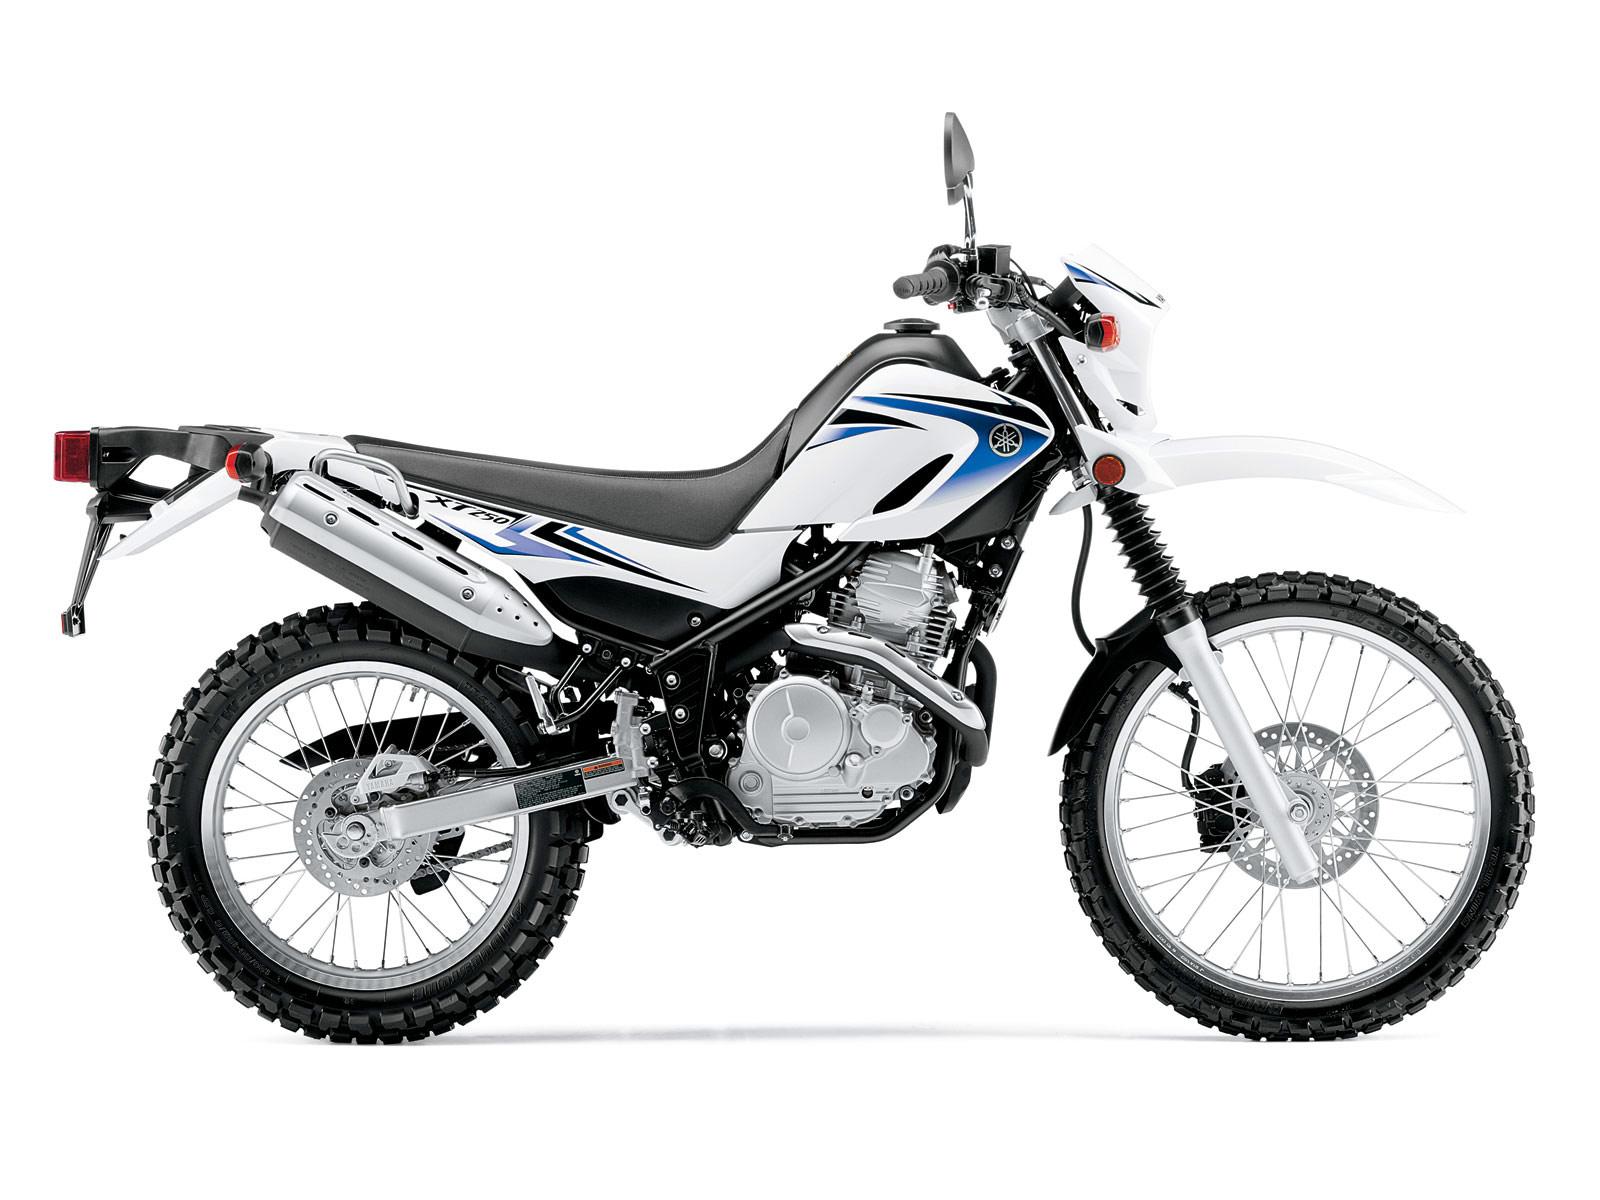 2012 yamaha xt250 motorcycle insurance information for Yamaha xt250 specs